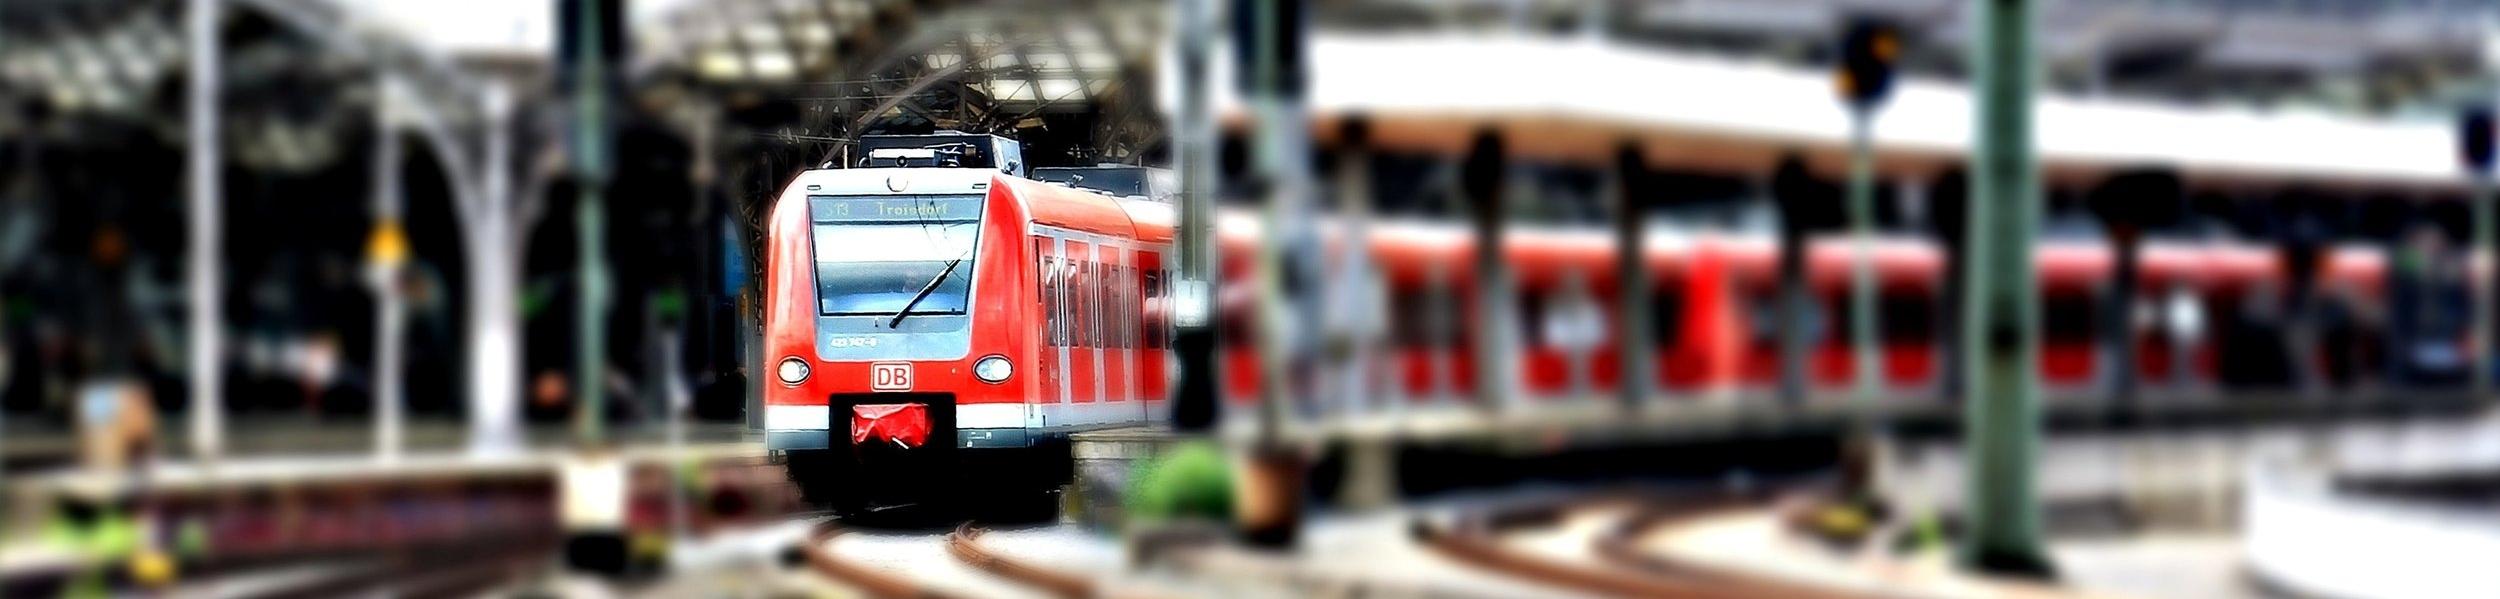 catenary-central-station-city-163580.jpg